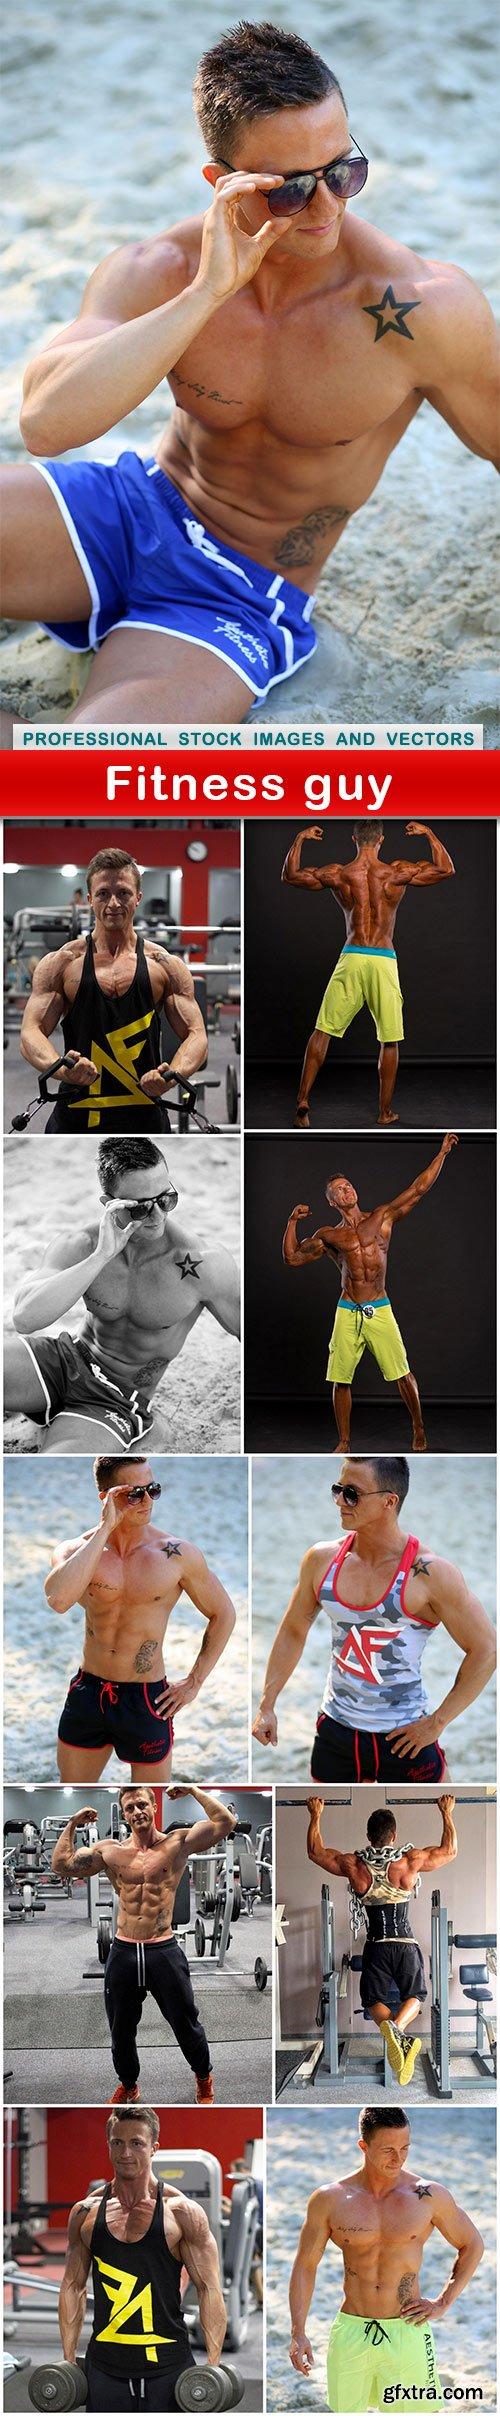 Fitness guy - 11 UHQ JPEG